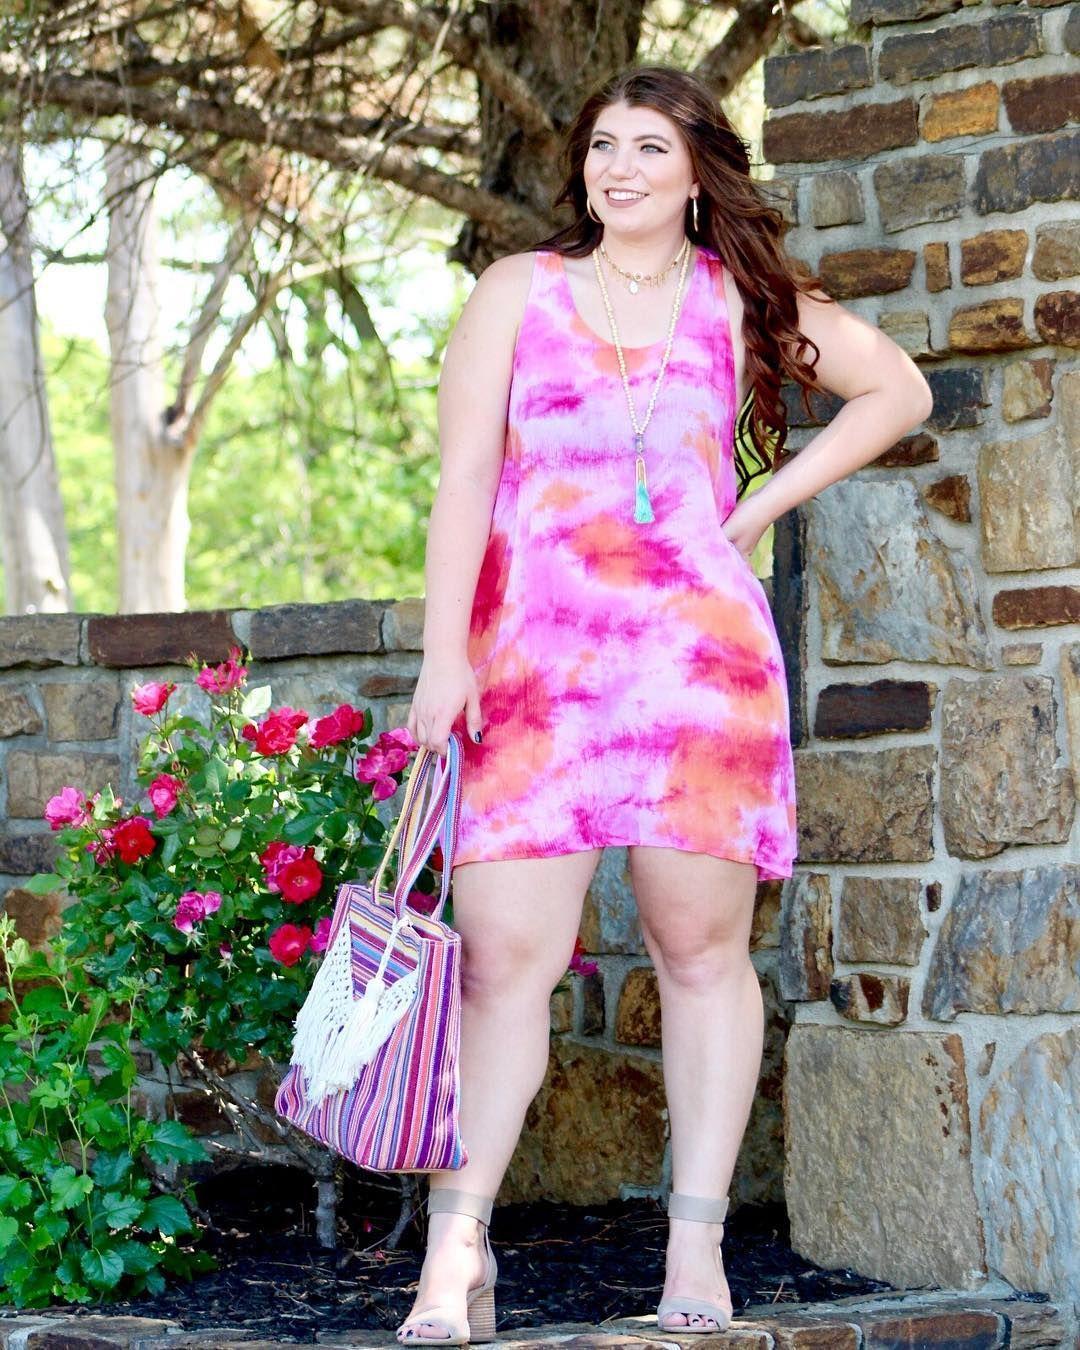 What else screams summer more than an on-trend tie-dye dress?! #shopamelias